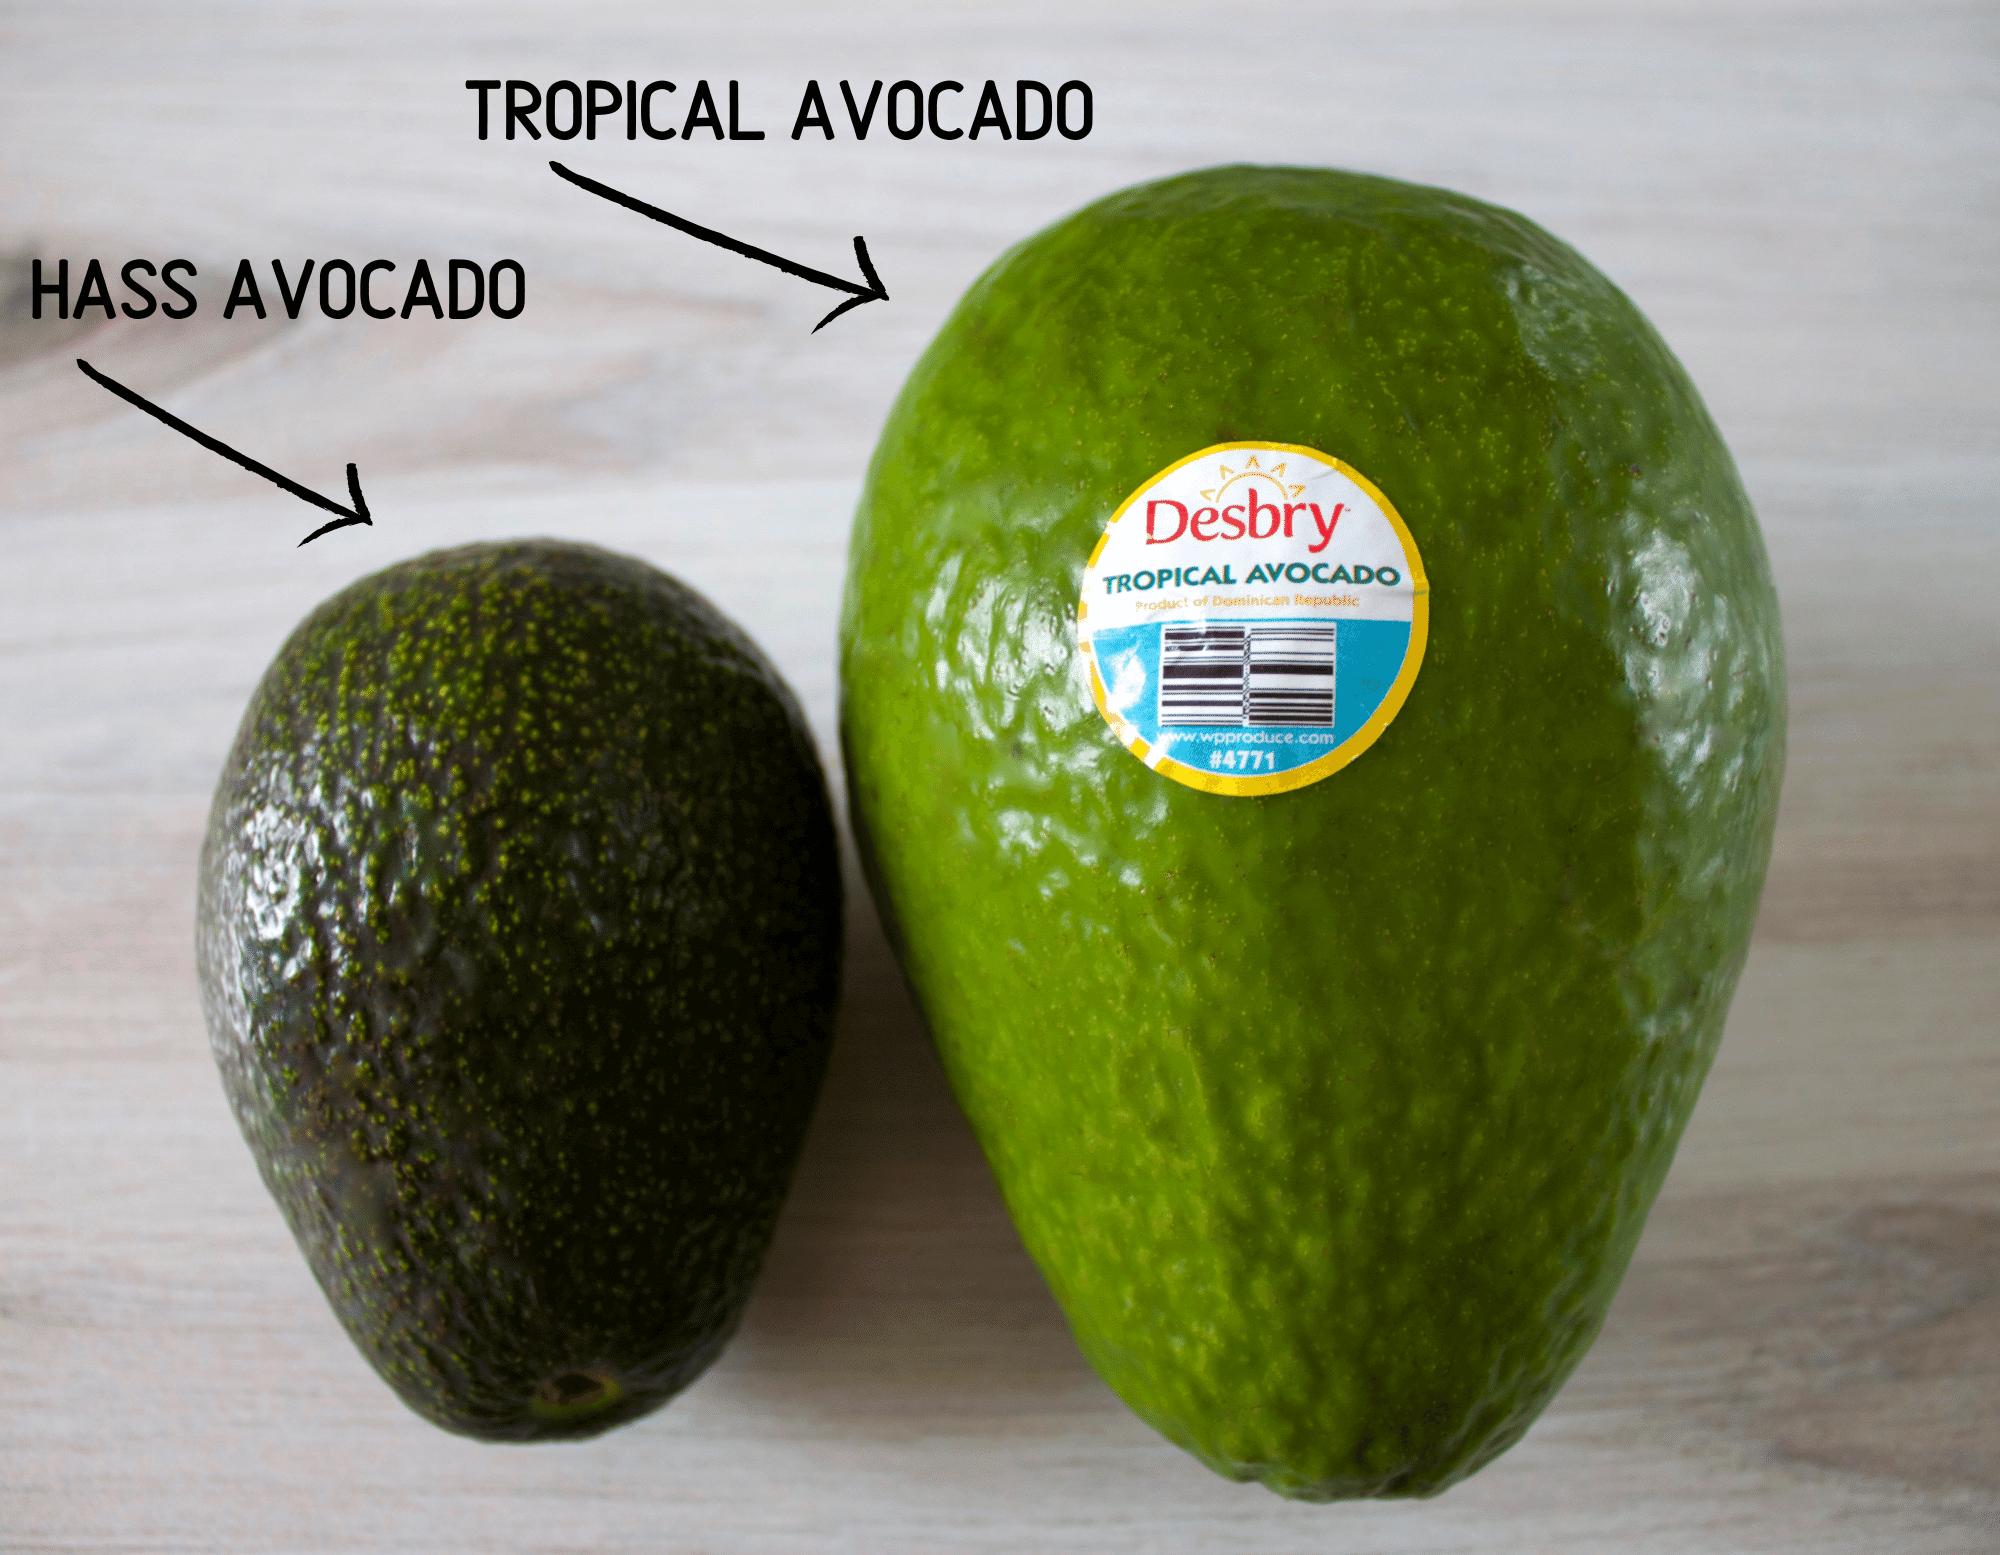 Haas vs tropical avocado